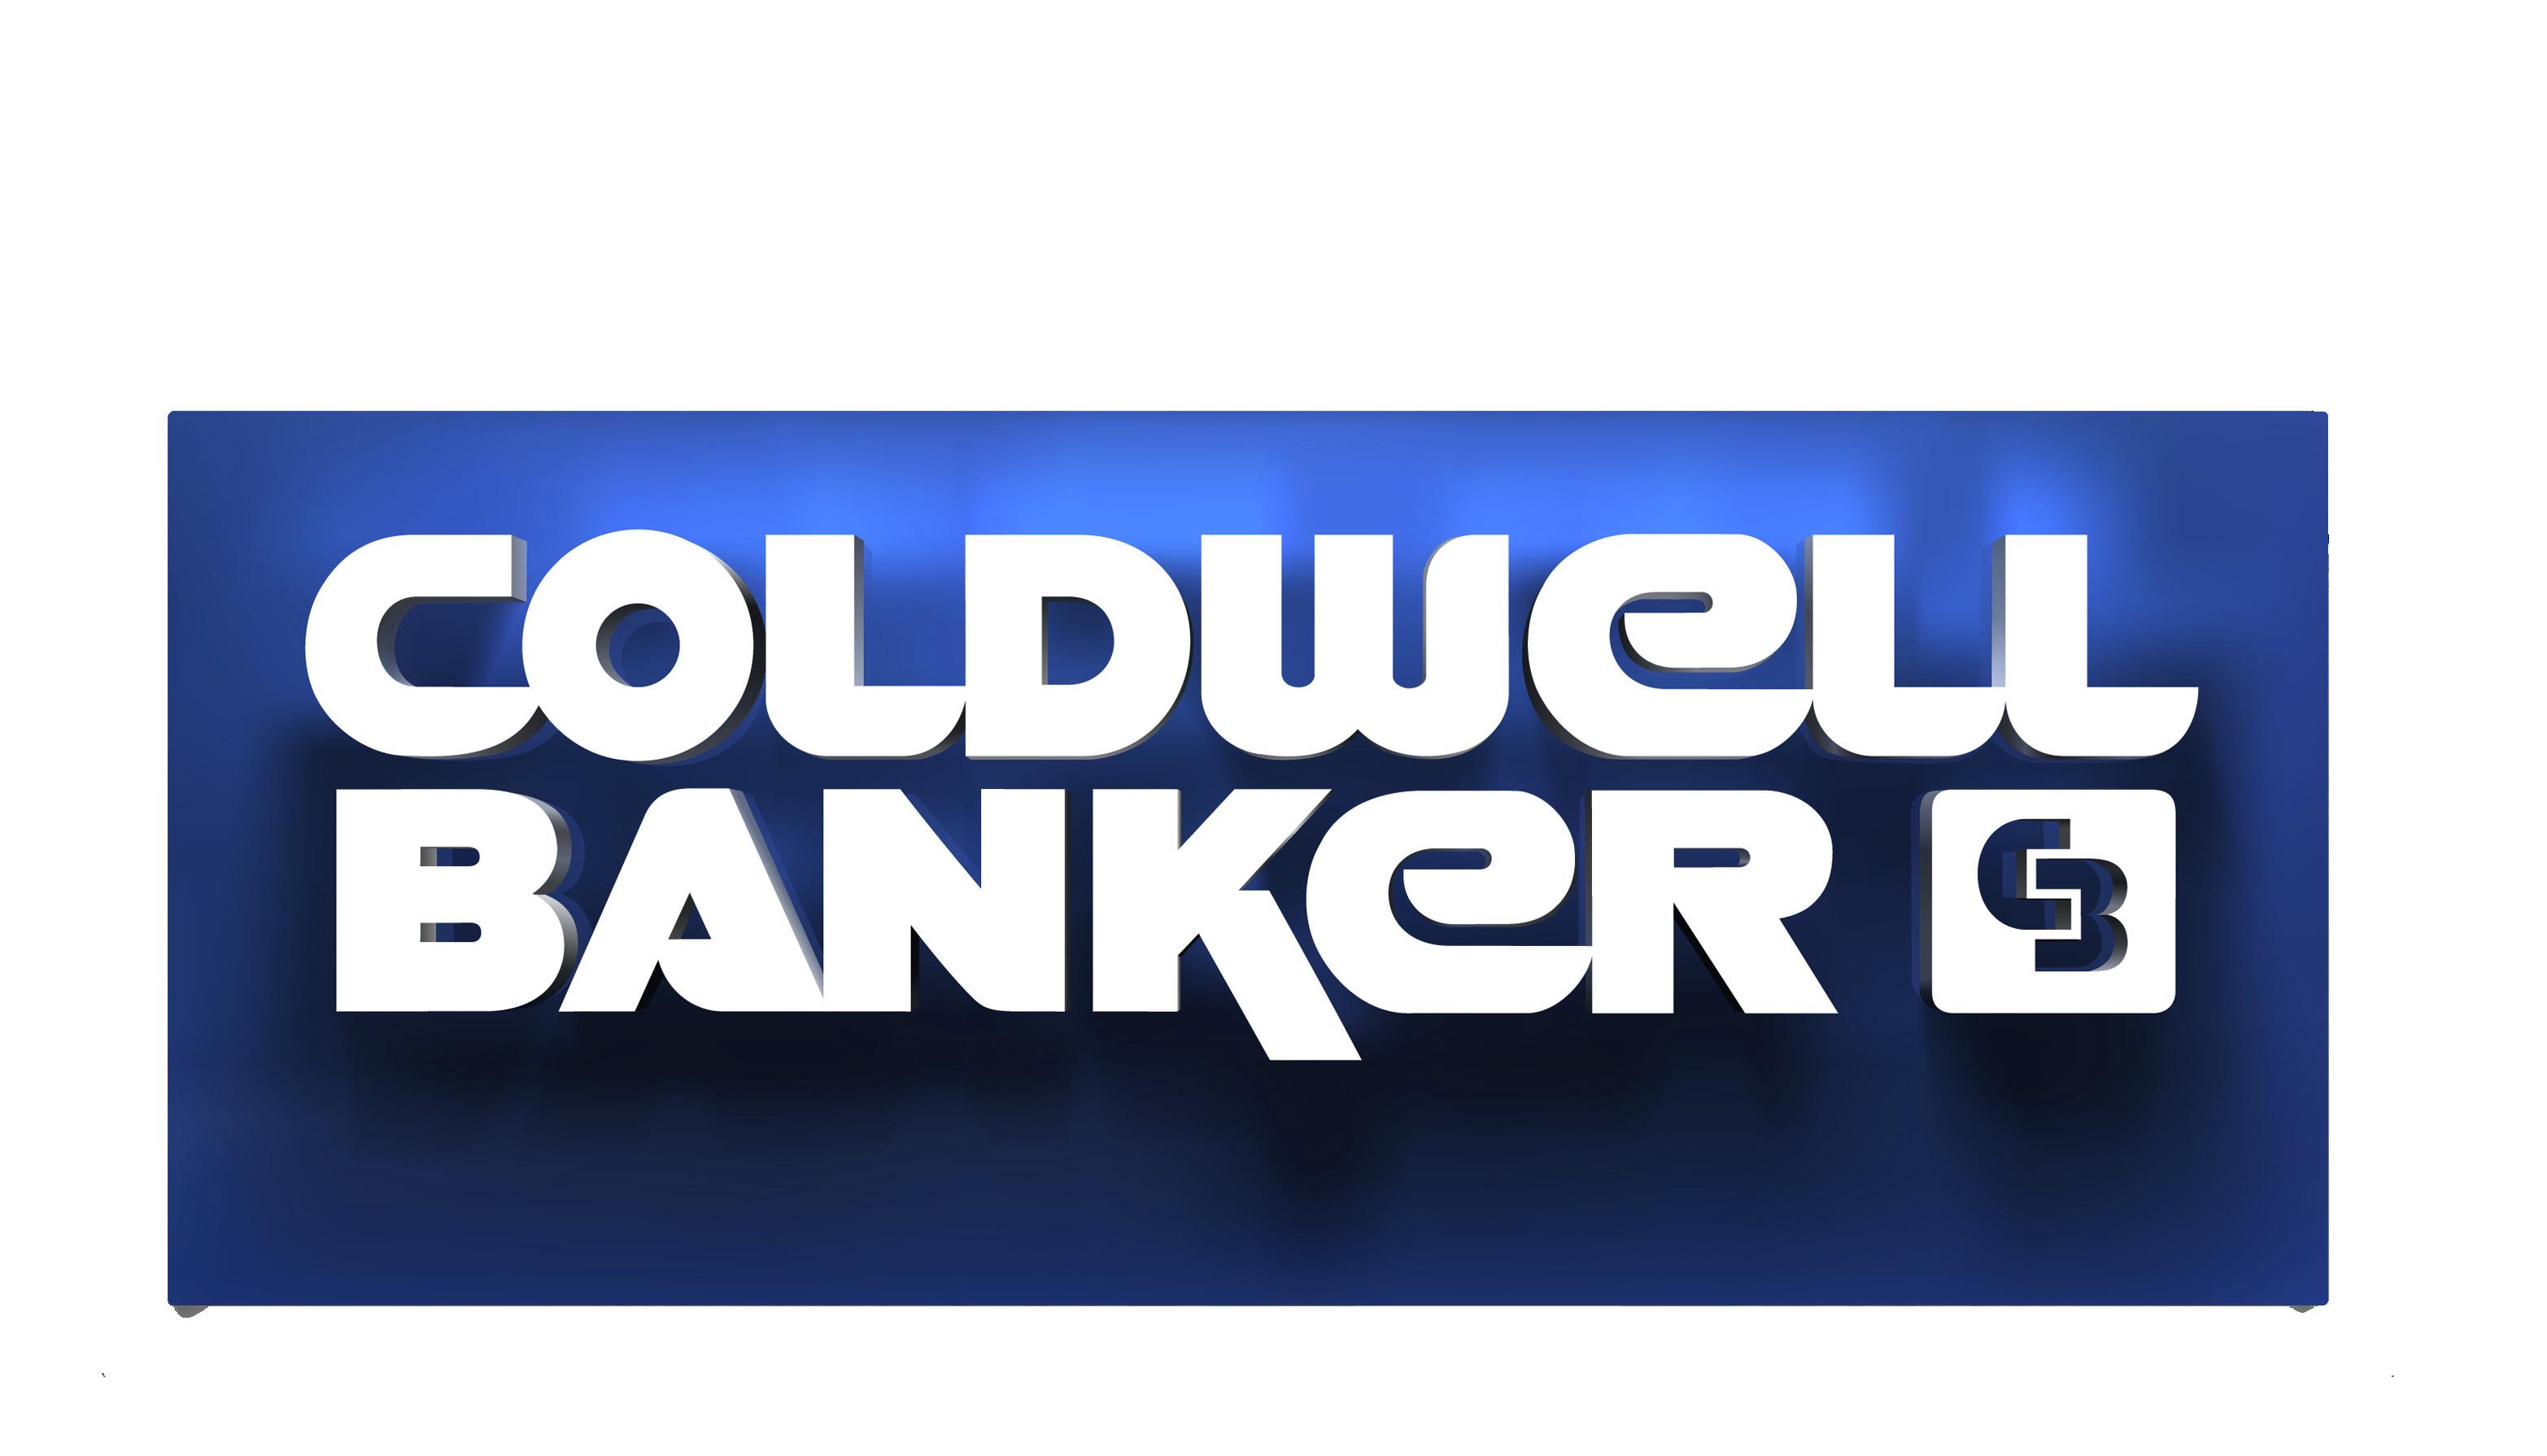 coldwell banker logos rh logolynx com coldwell banker commercial logo vector Coldwell Banker Sold Sign